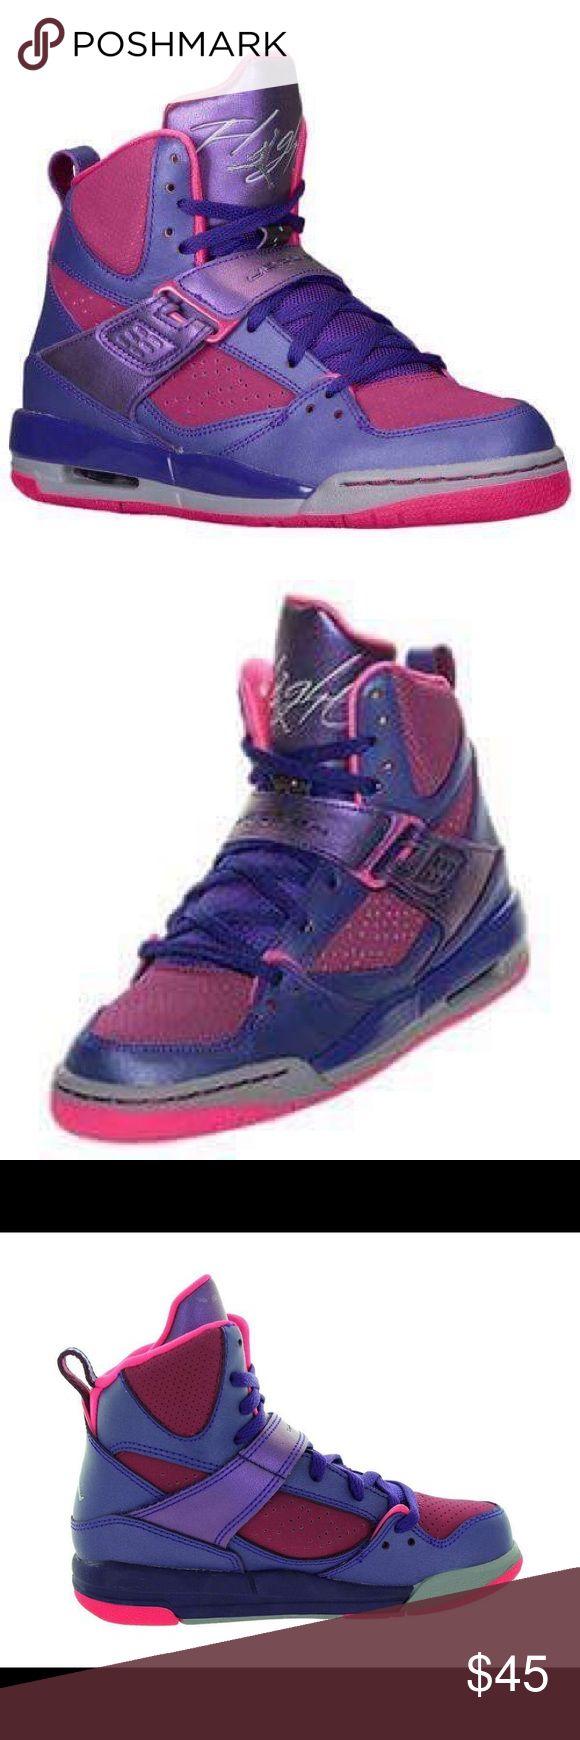 🔥🔥🔥Air Jordan Flight 45 high sneakers 🐻🦊🦁🐒 Use very good Nike air flight Jordan sneakers pink and purple size 2 youth nike Shoes Sneakers